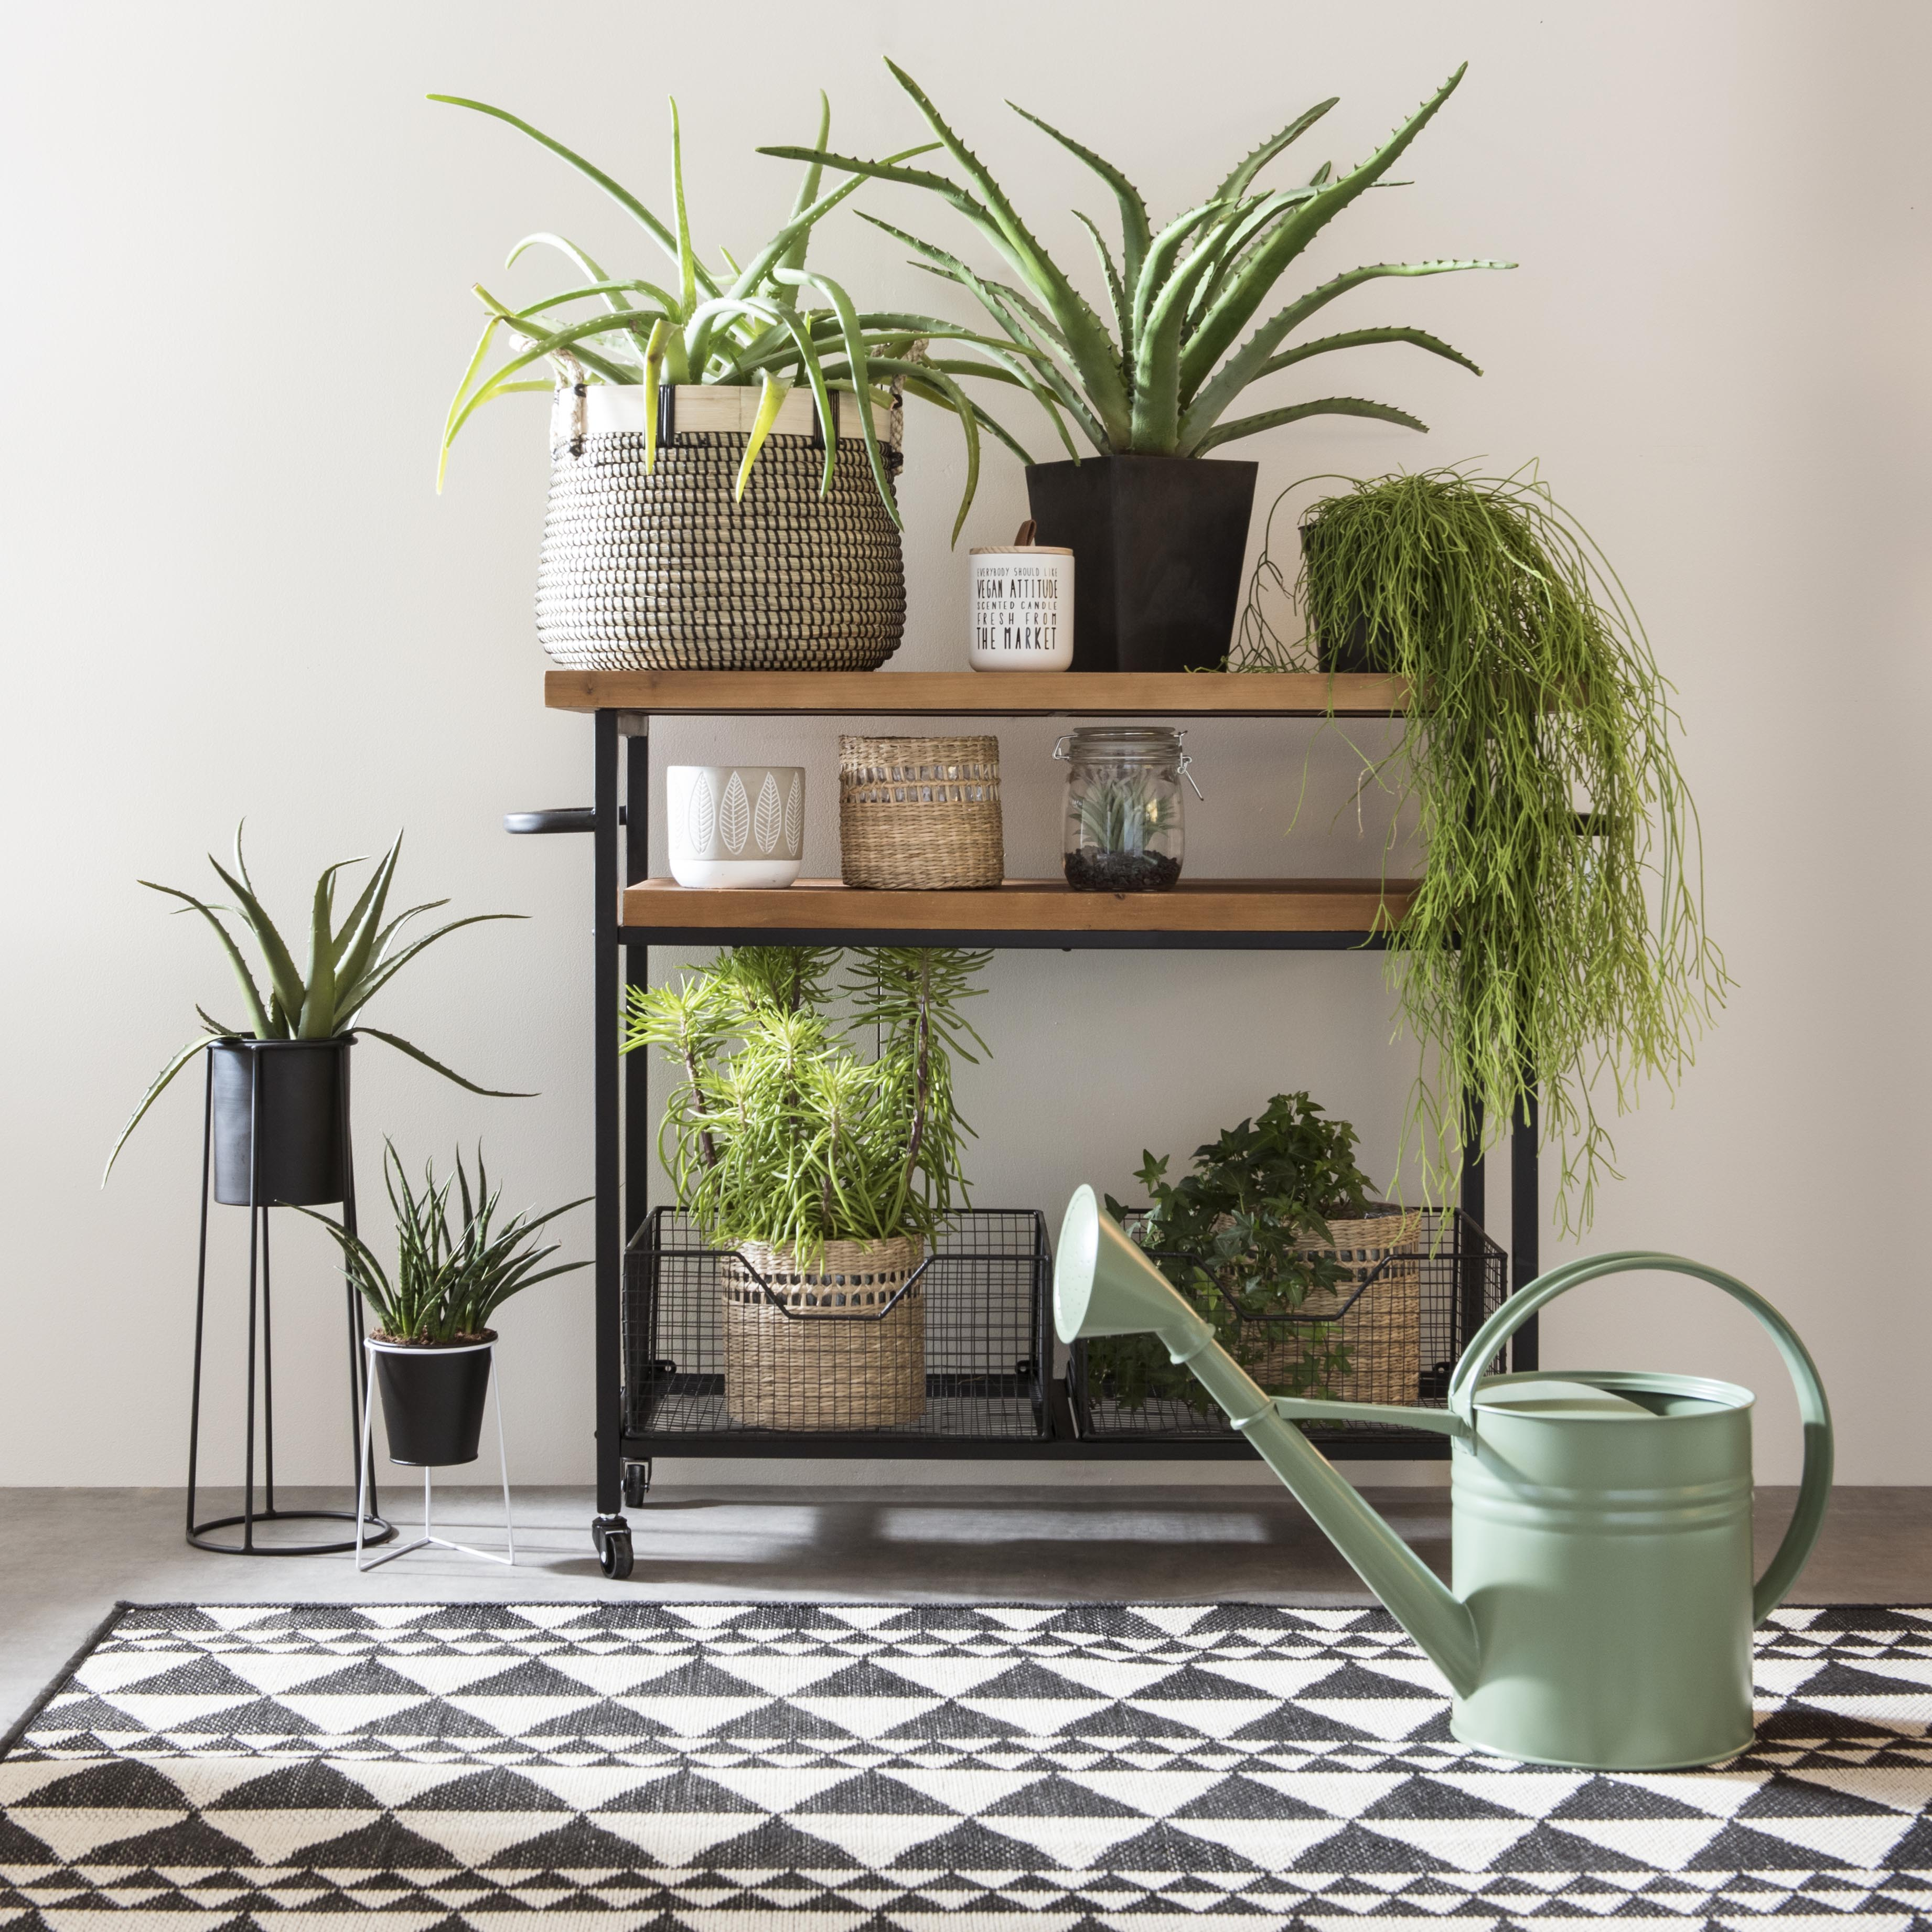 maisons du monde uk segu maison. Black Bedroom Furniture Sets. Home Design Ideas